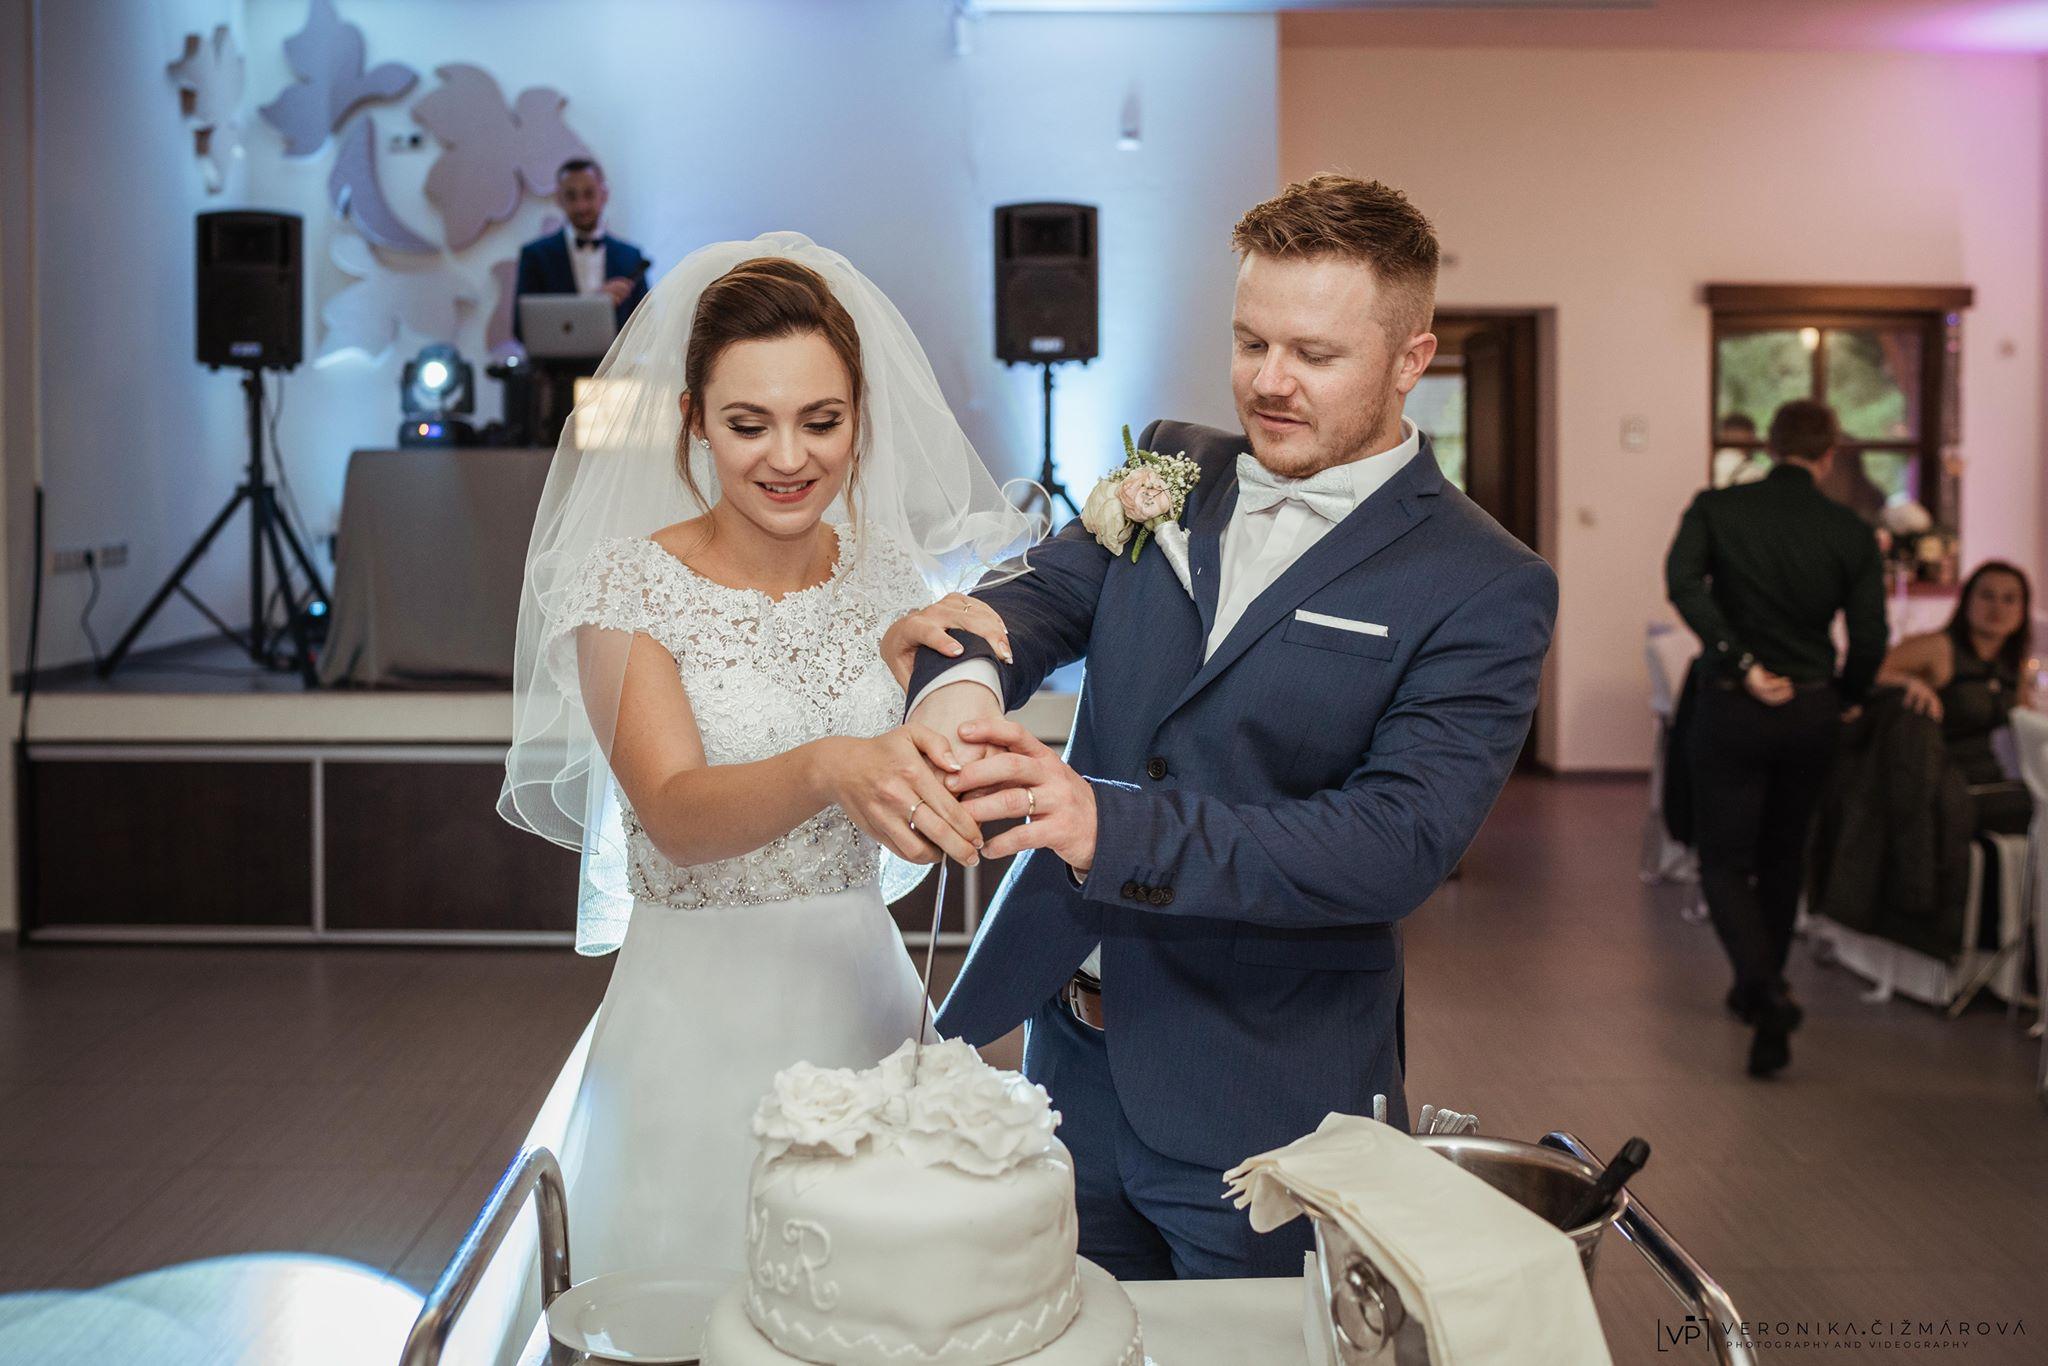 svadba-krajanie-torty-program-na-svadbujpg